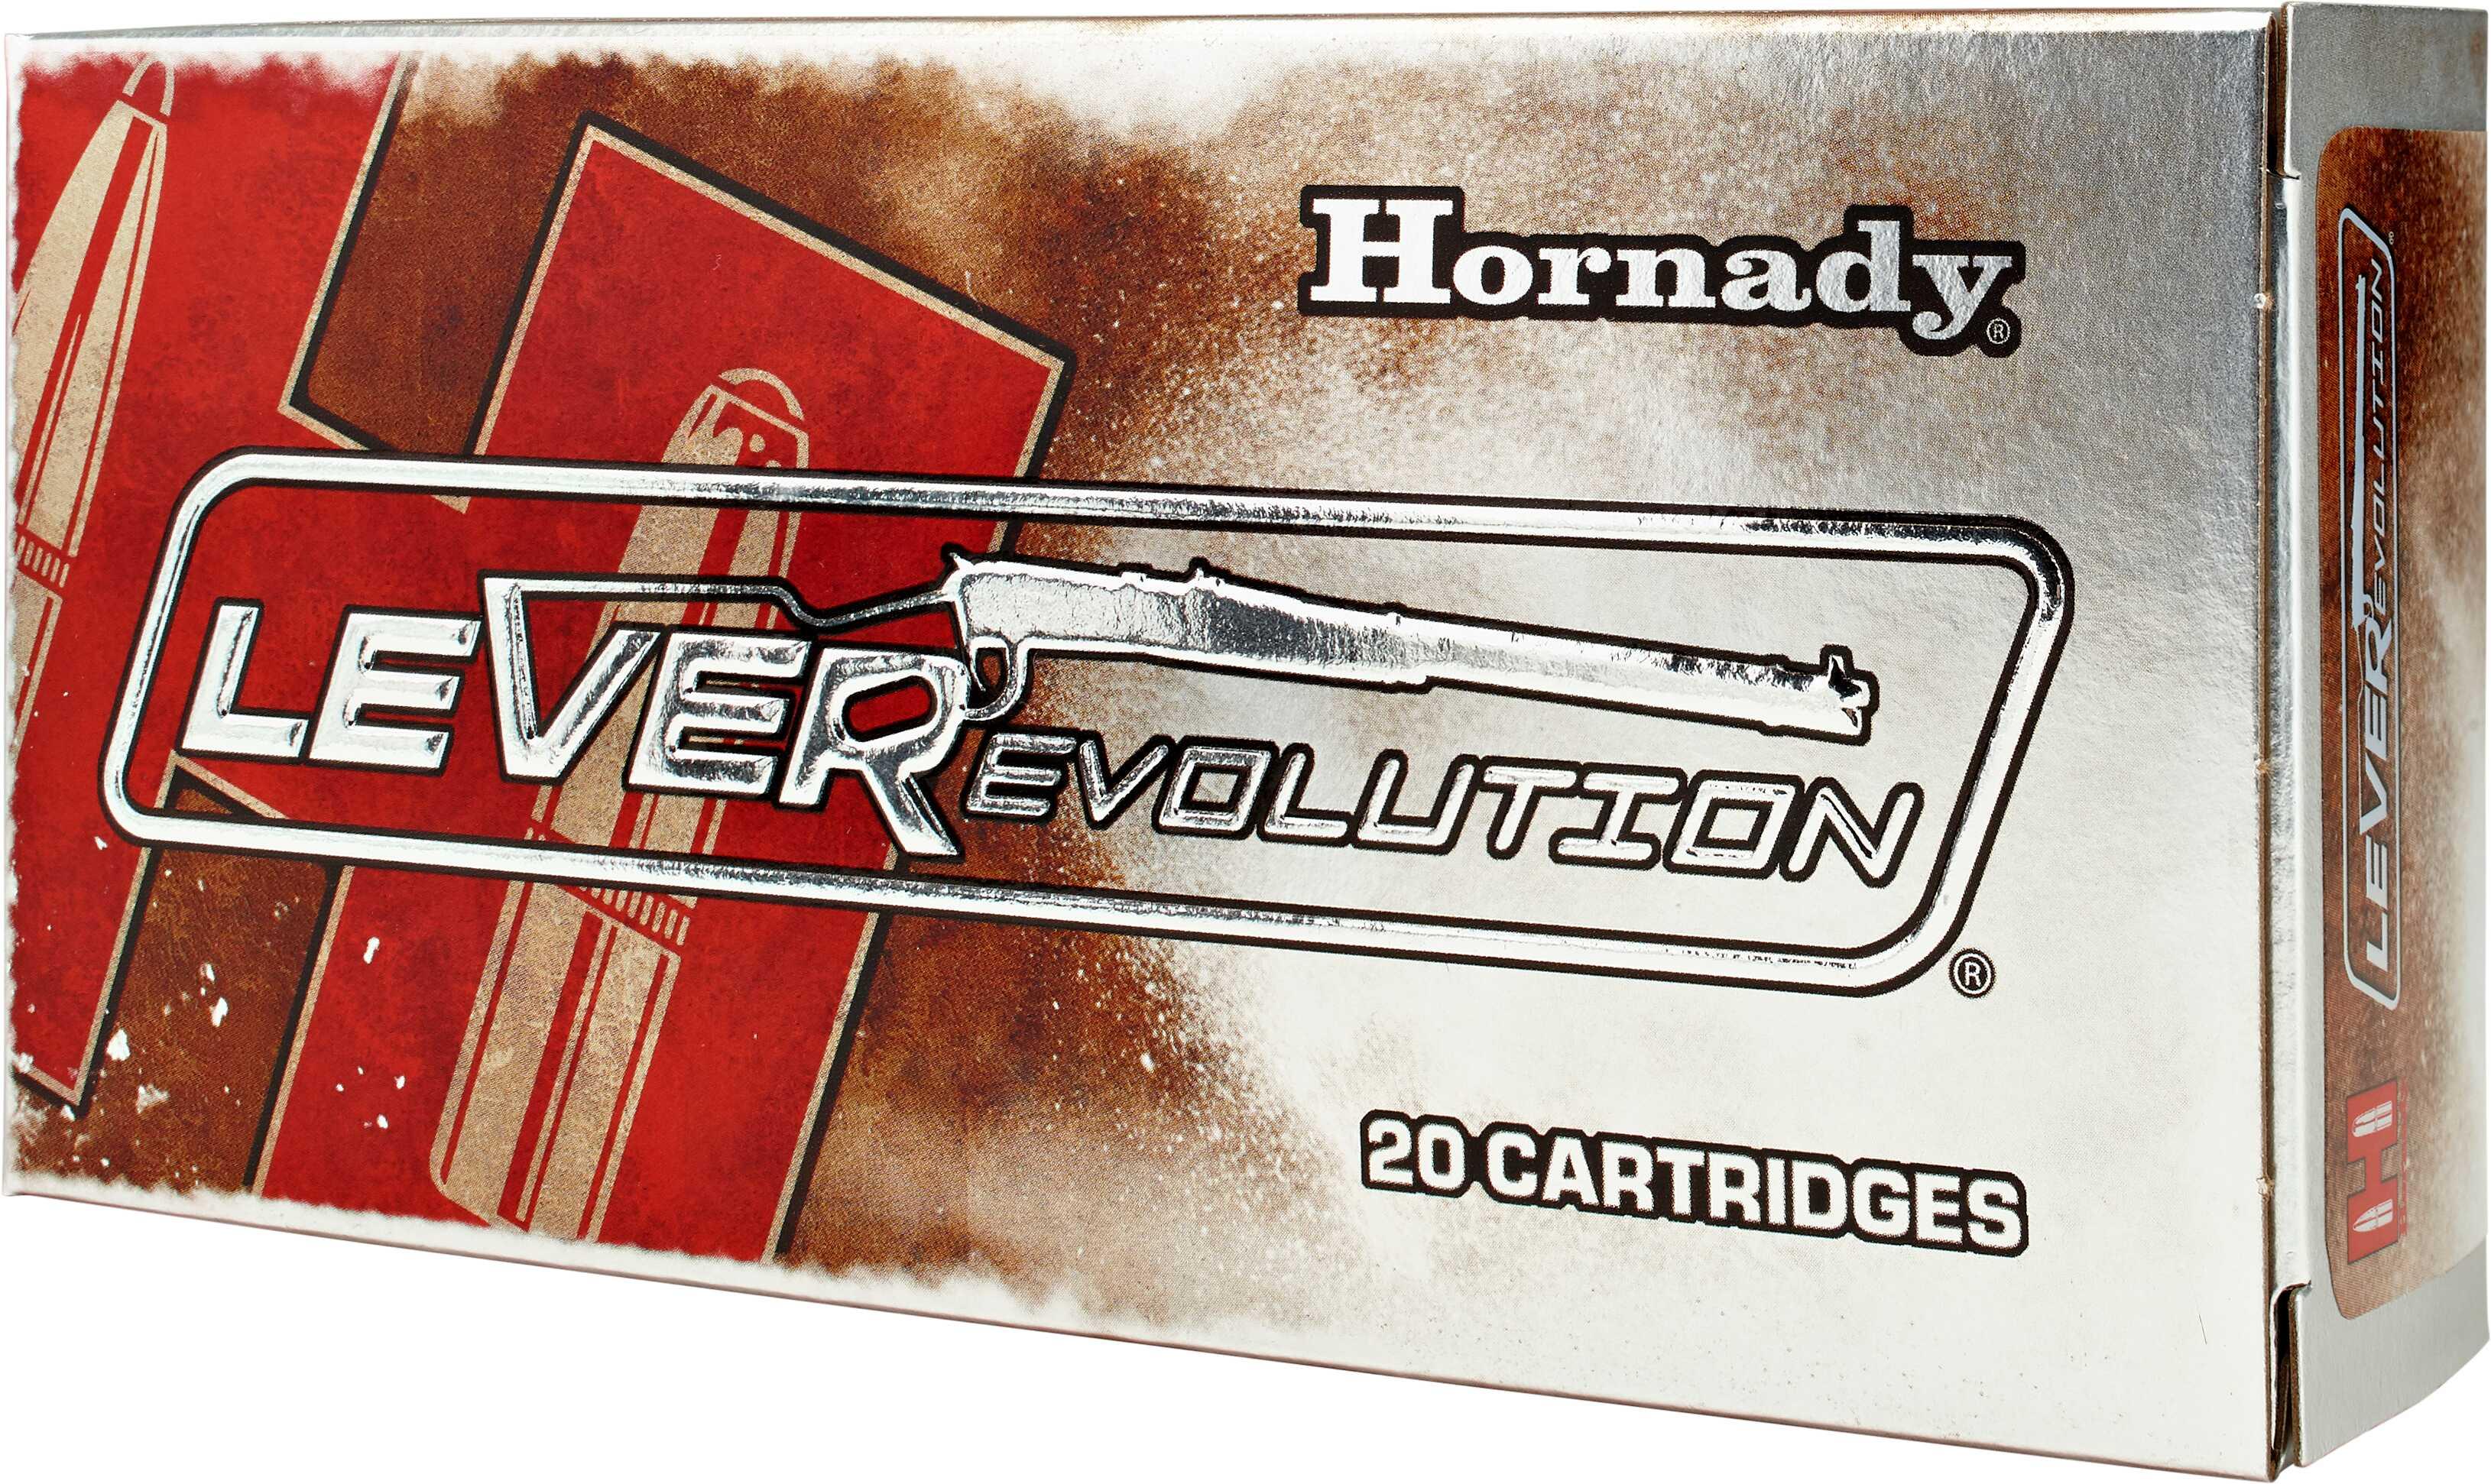 35 Remington By Hornady 200 Grain Leverevolution Per 20 Ammunition Md: 82735